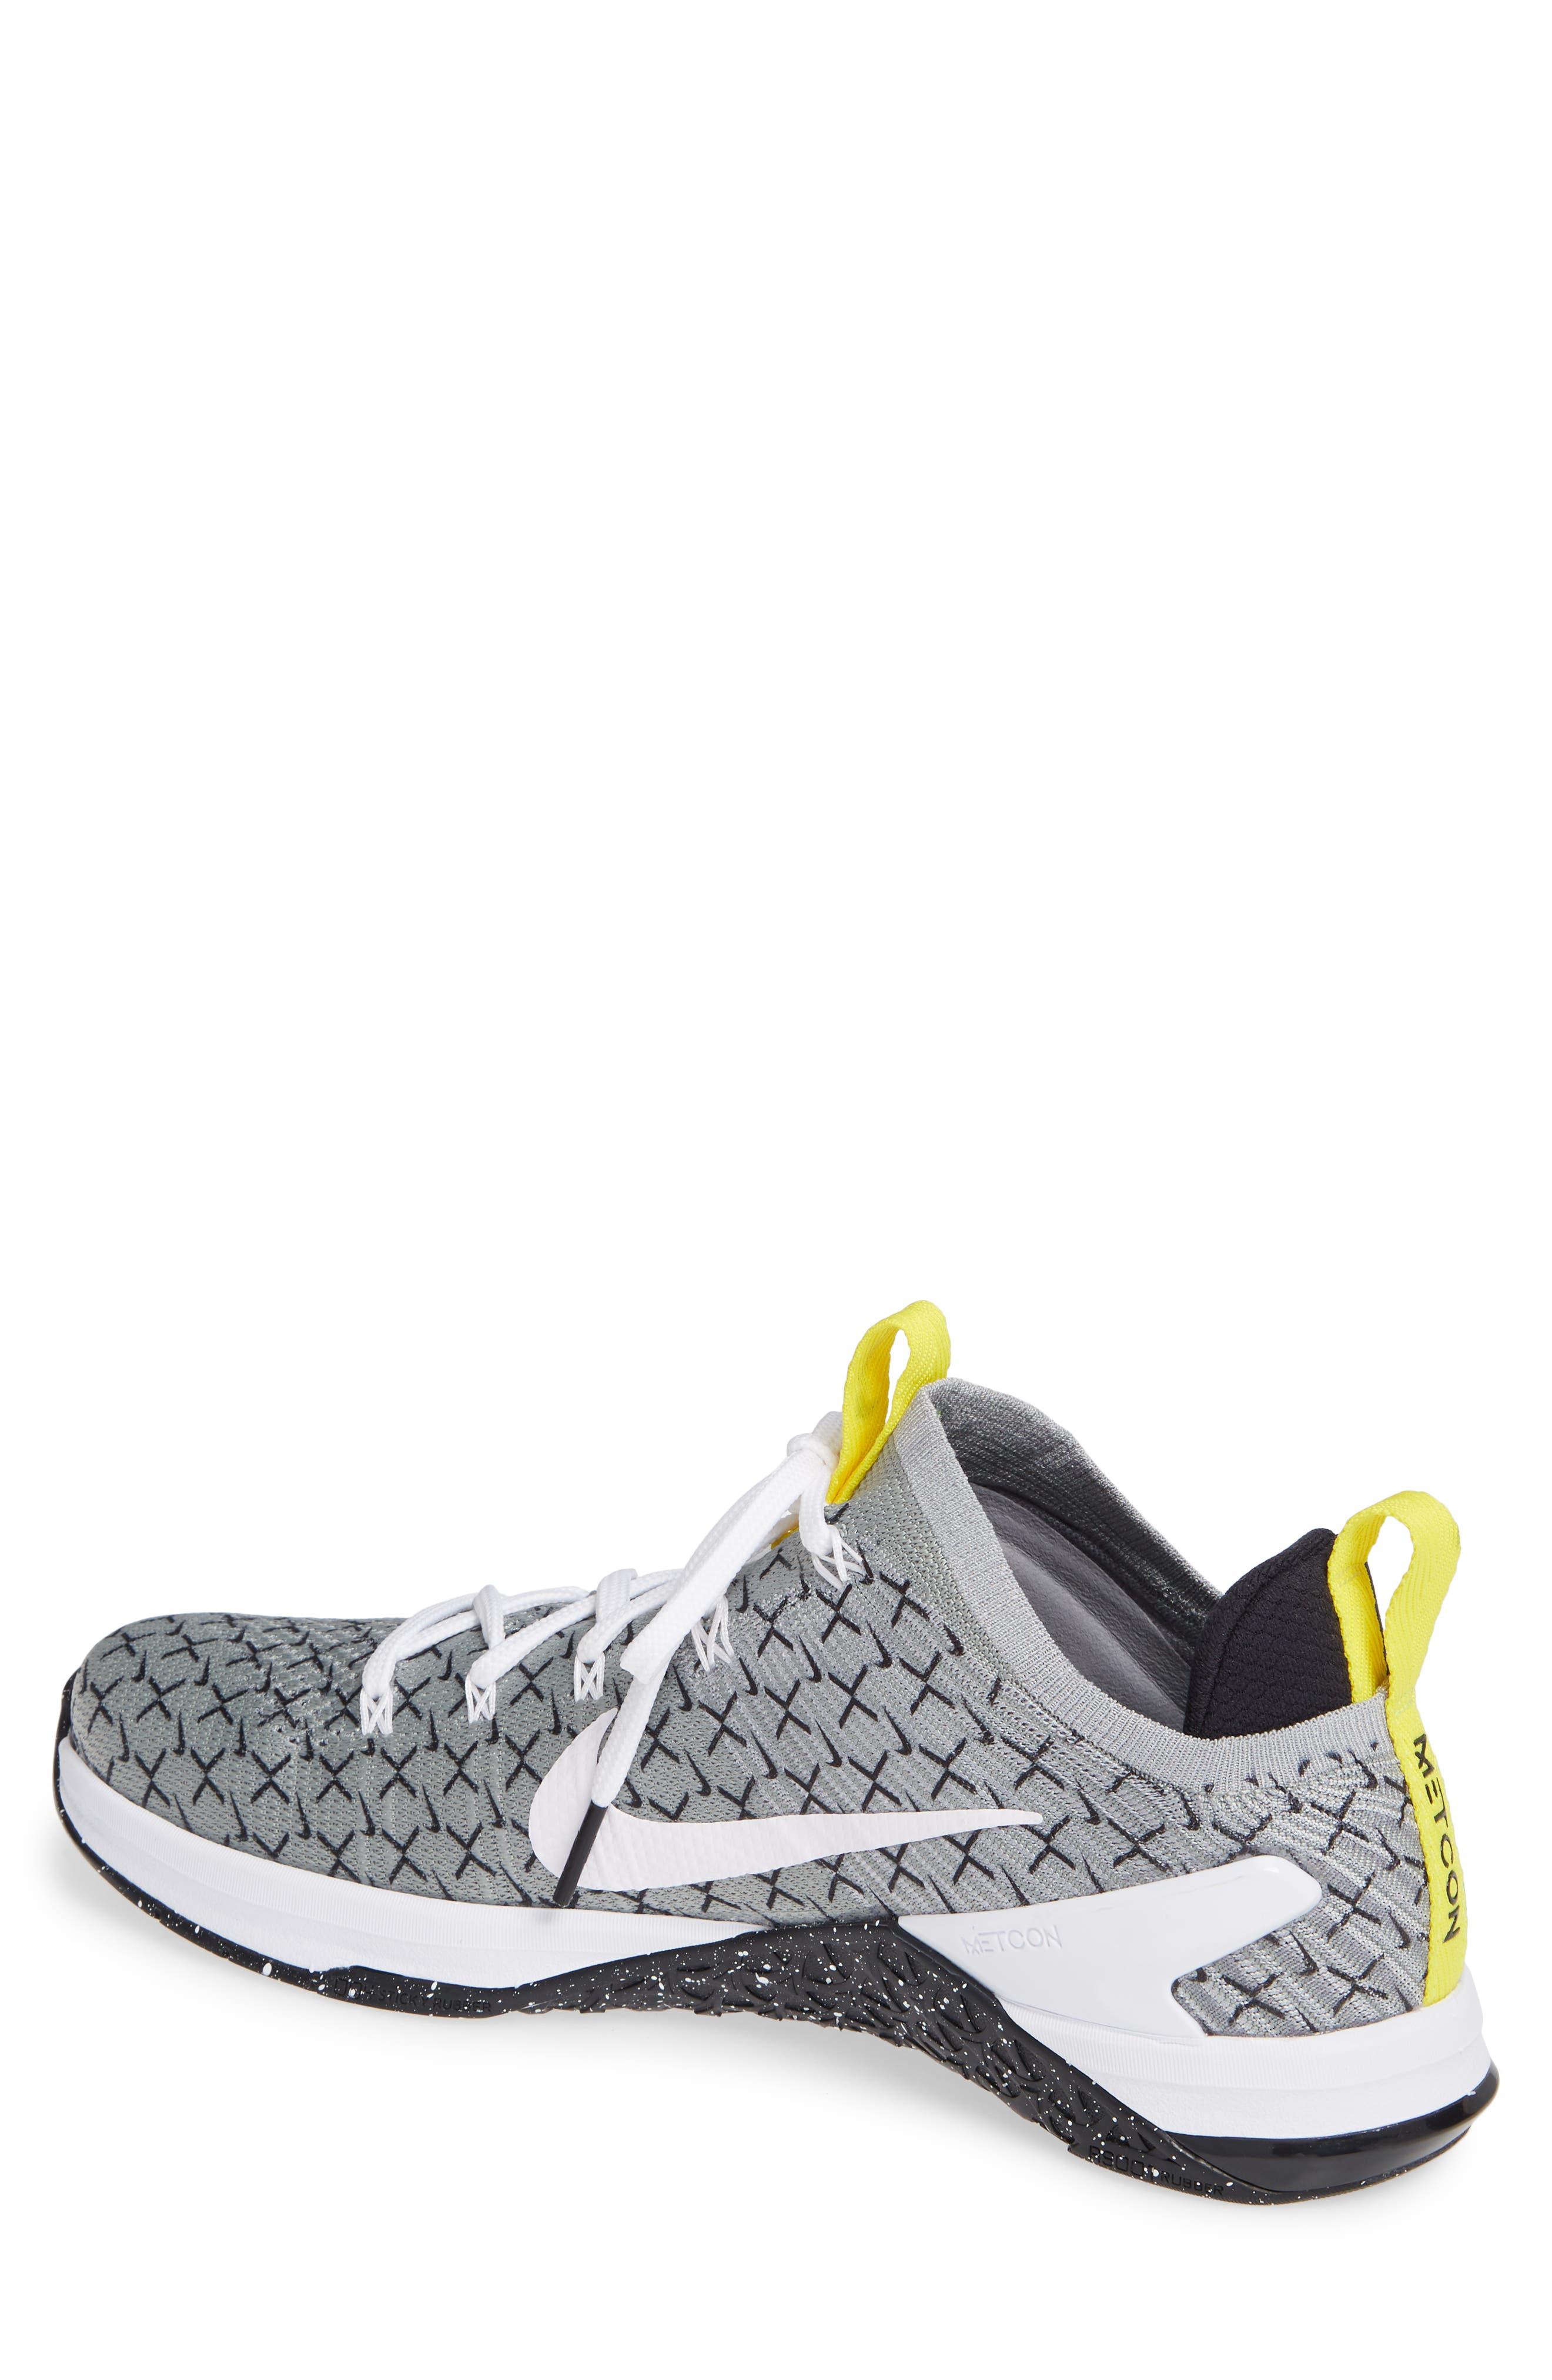 Metcon DSX Flyknit 2 Training Shoe,                             Alternate thumbnail 2, color,                             017